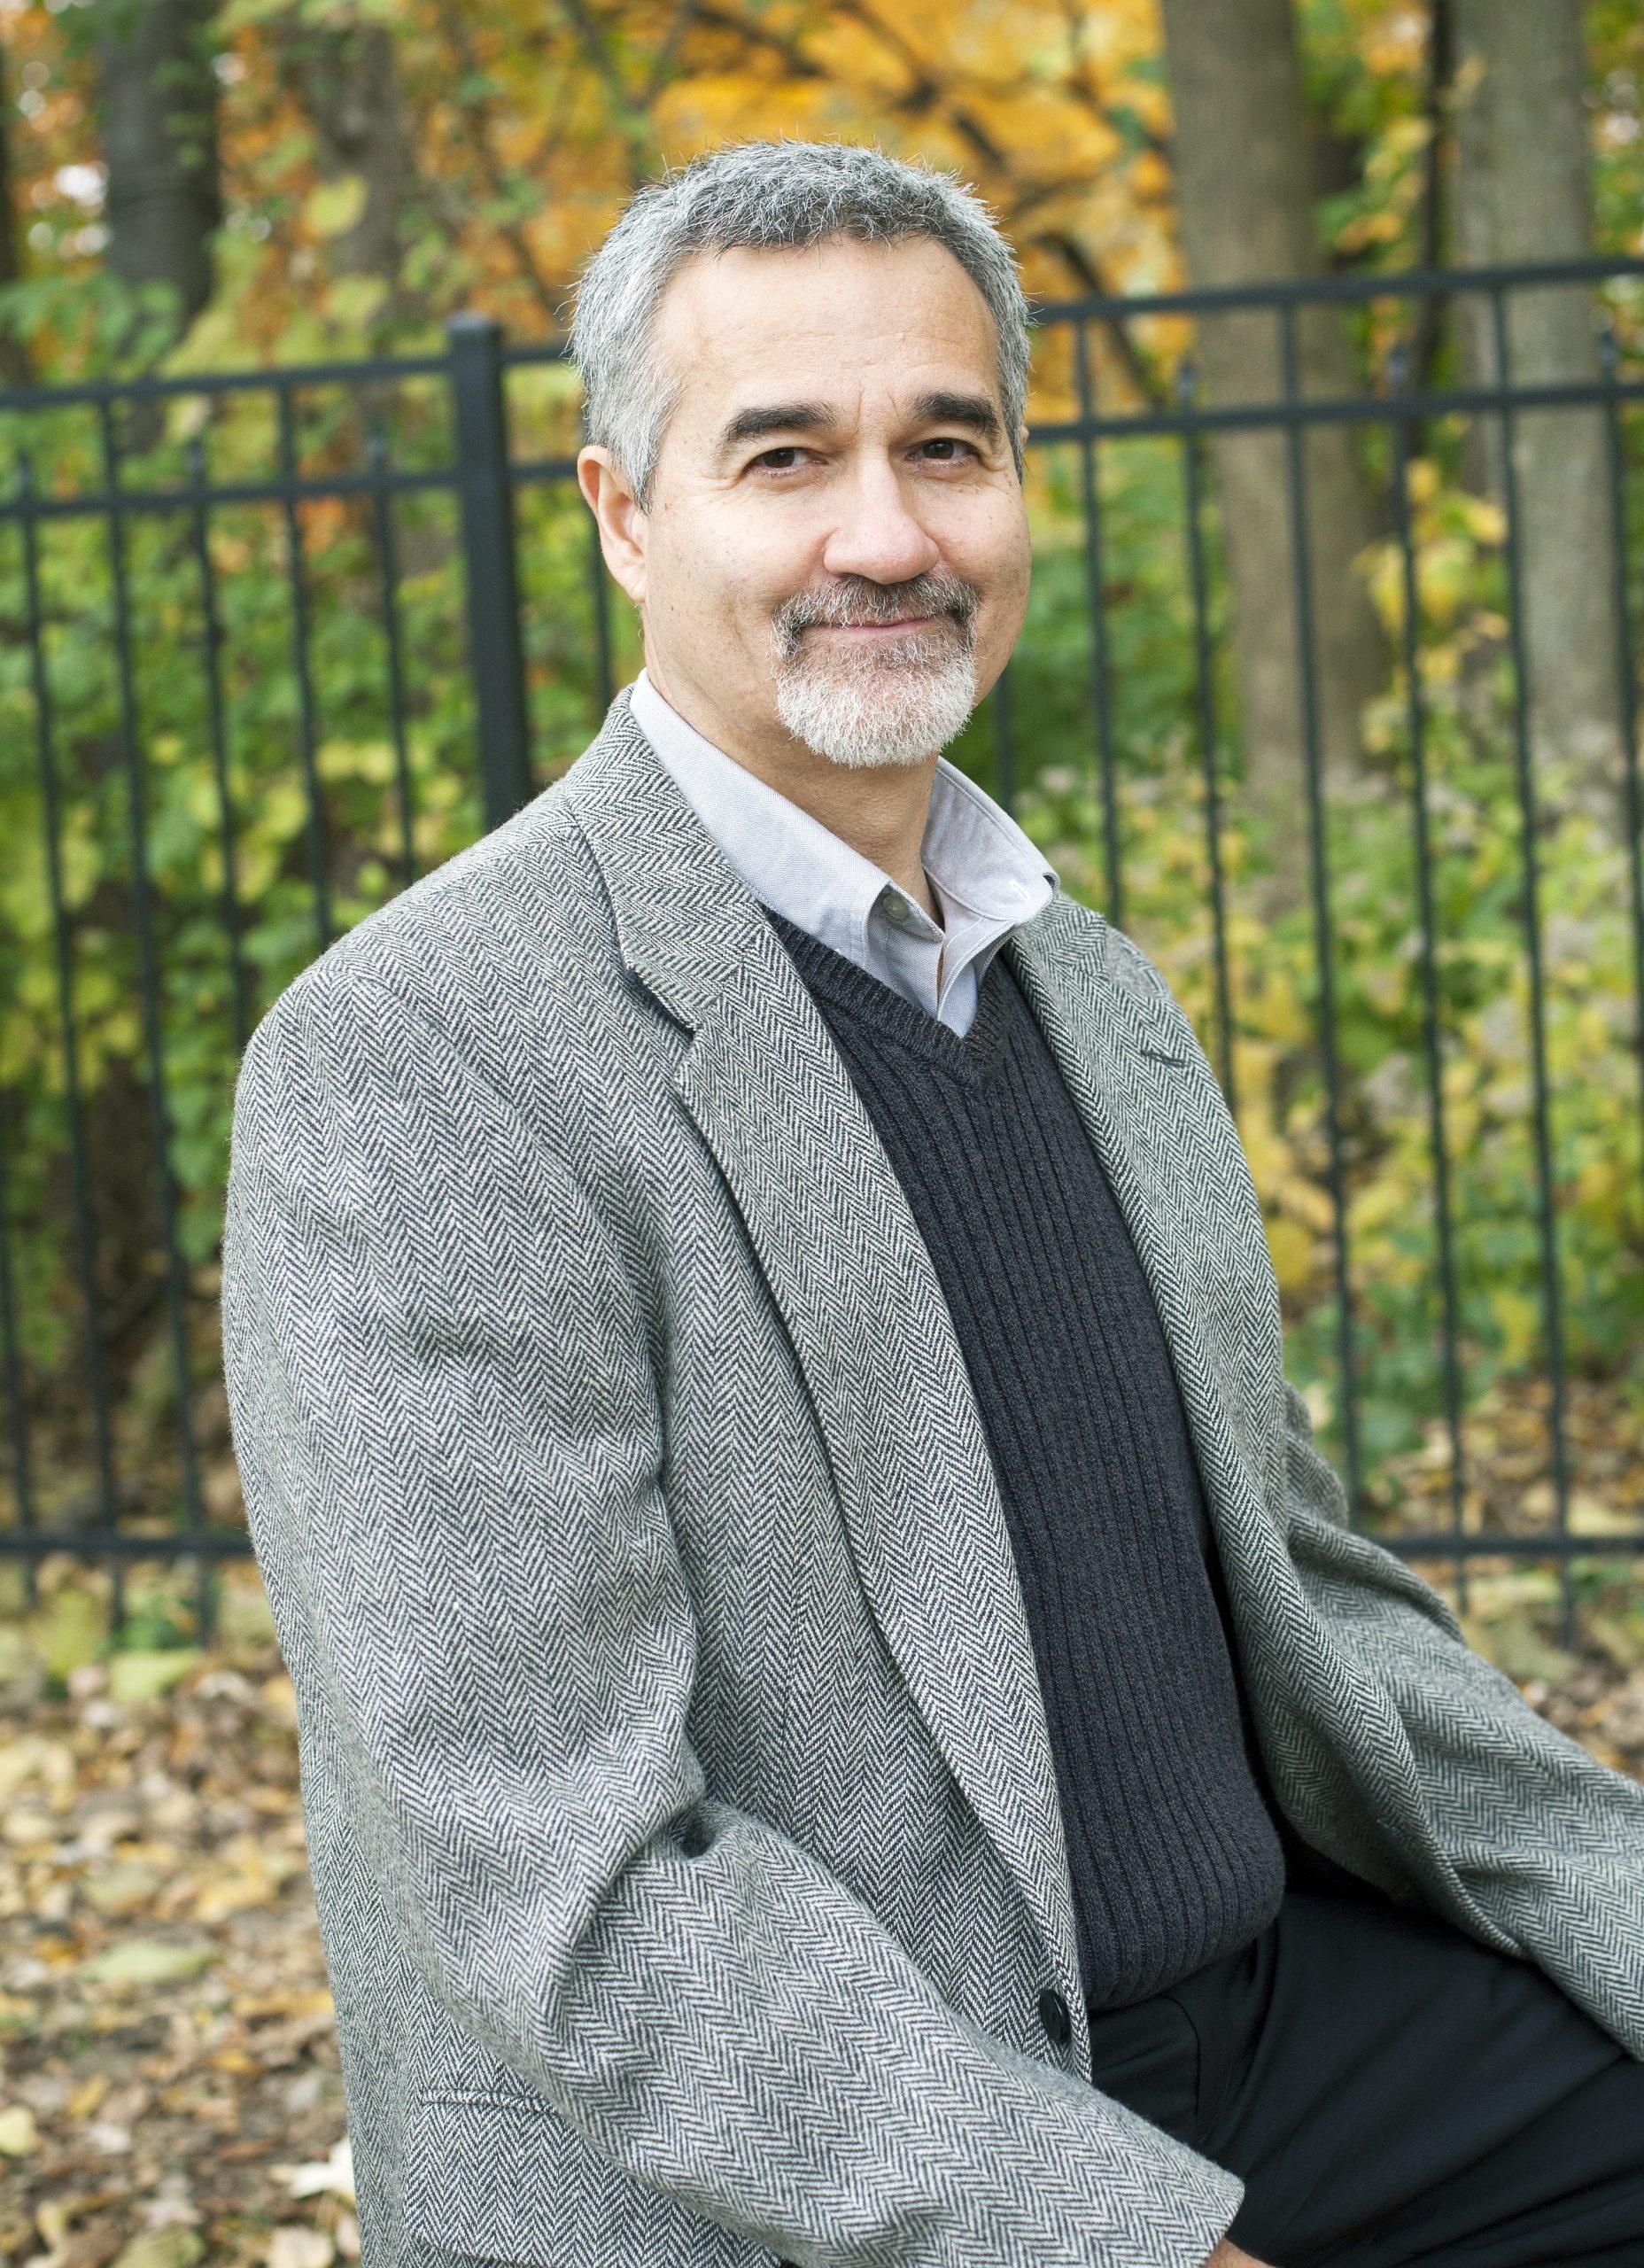 Dr. Bruce McLaughlin